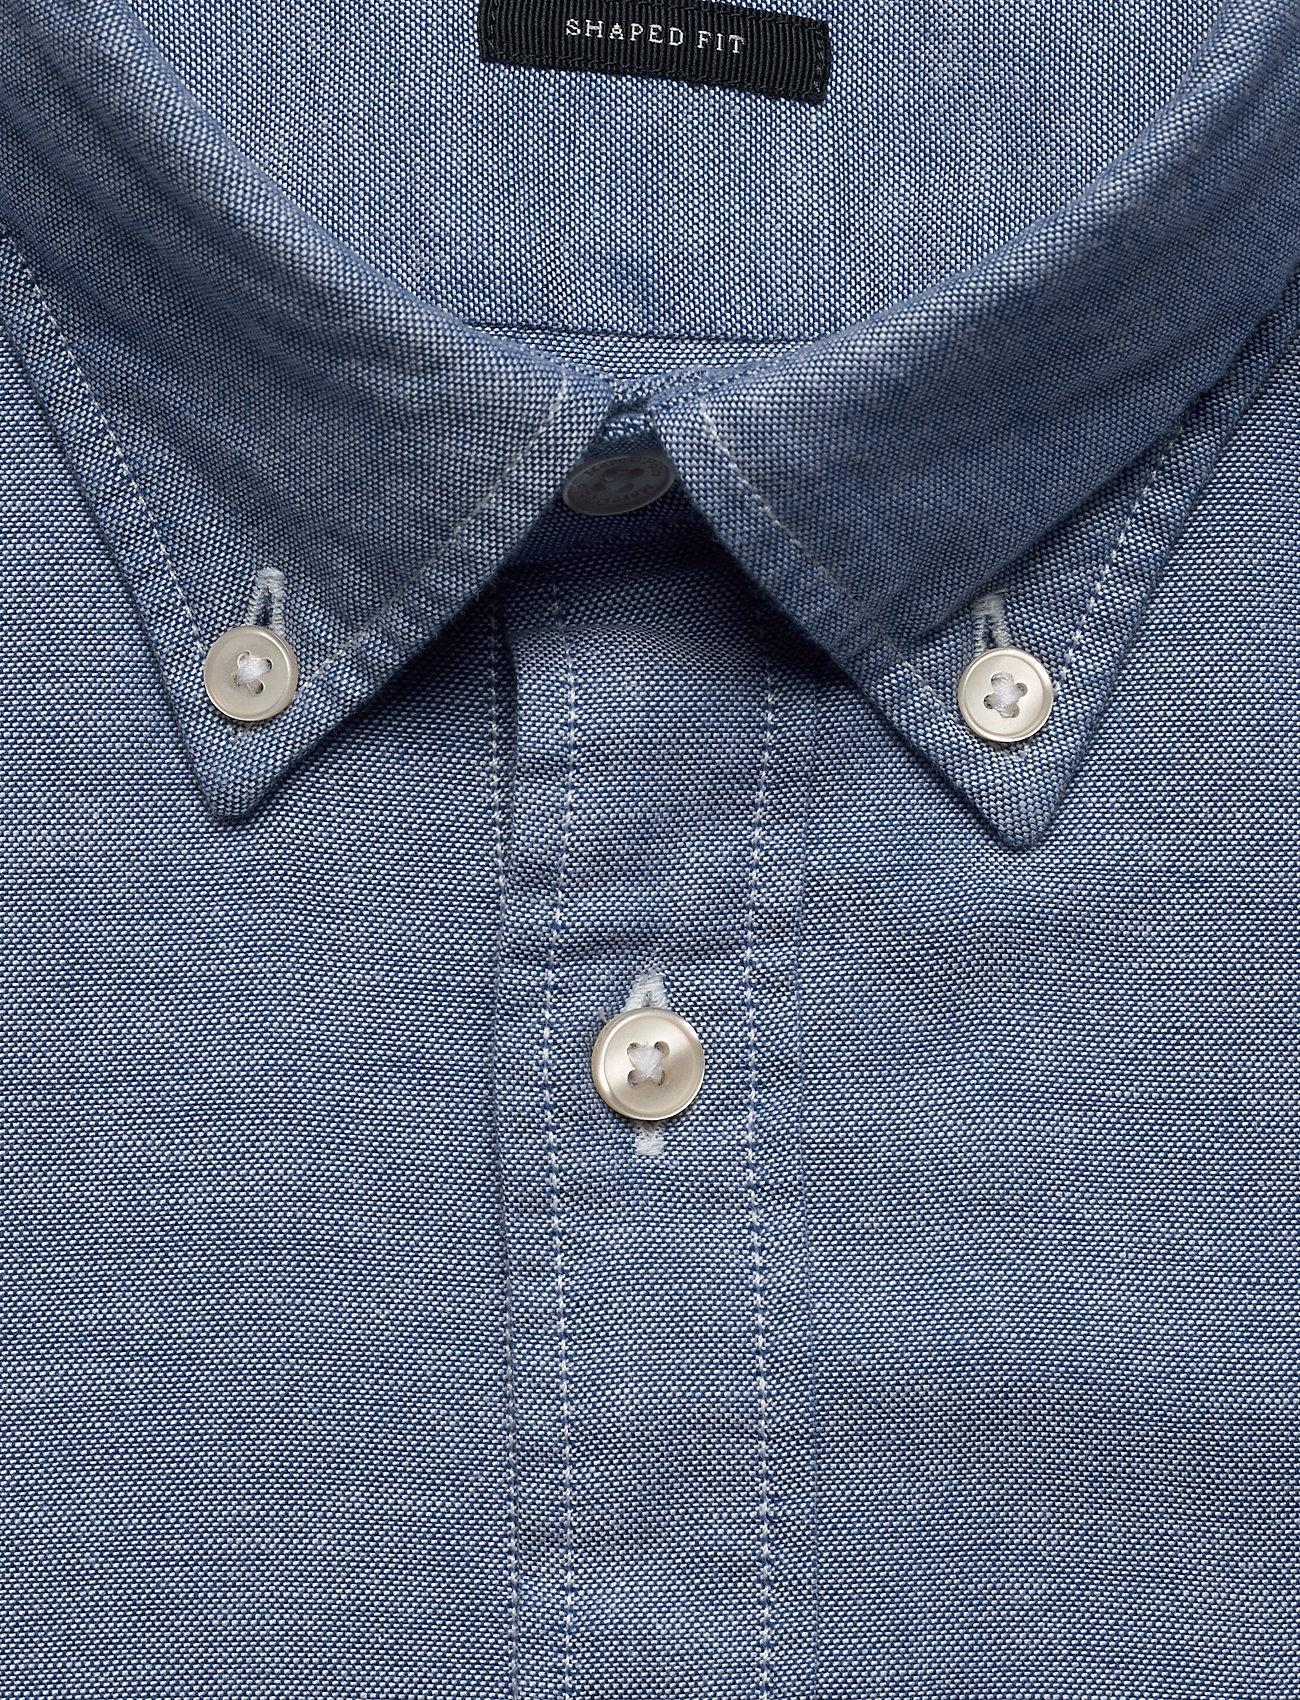 Marc O'Polo Button down long sleeve stitching- Chemises blp9Uj7g 4iyhQ sRtIZf3v